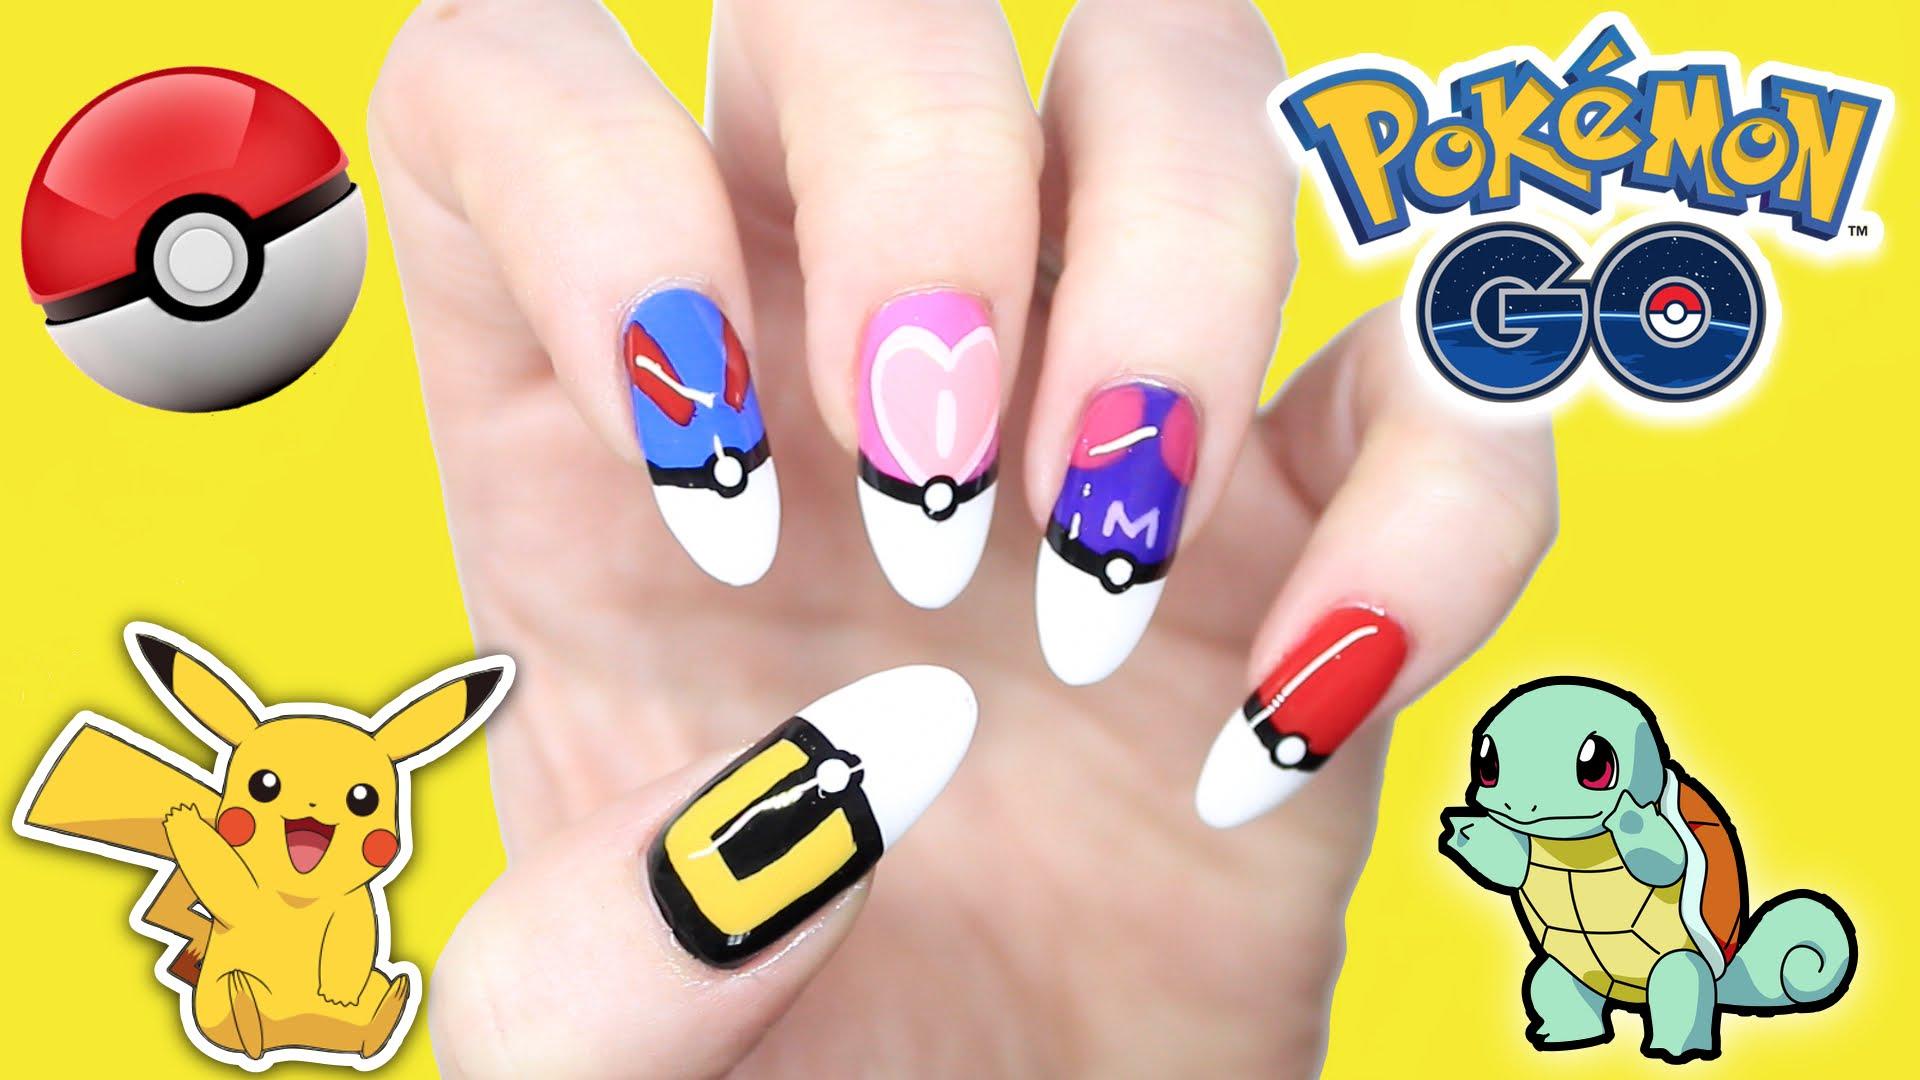 Cách vẽ móng tay hình Pokemon GO